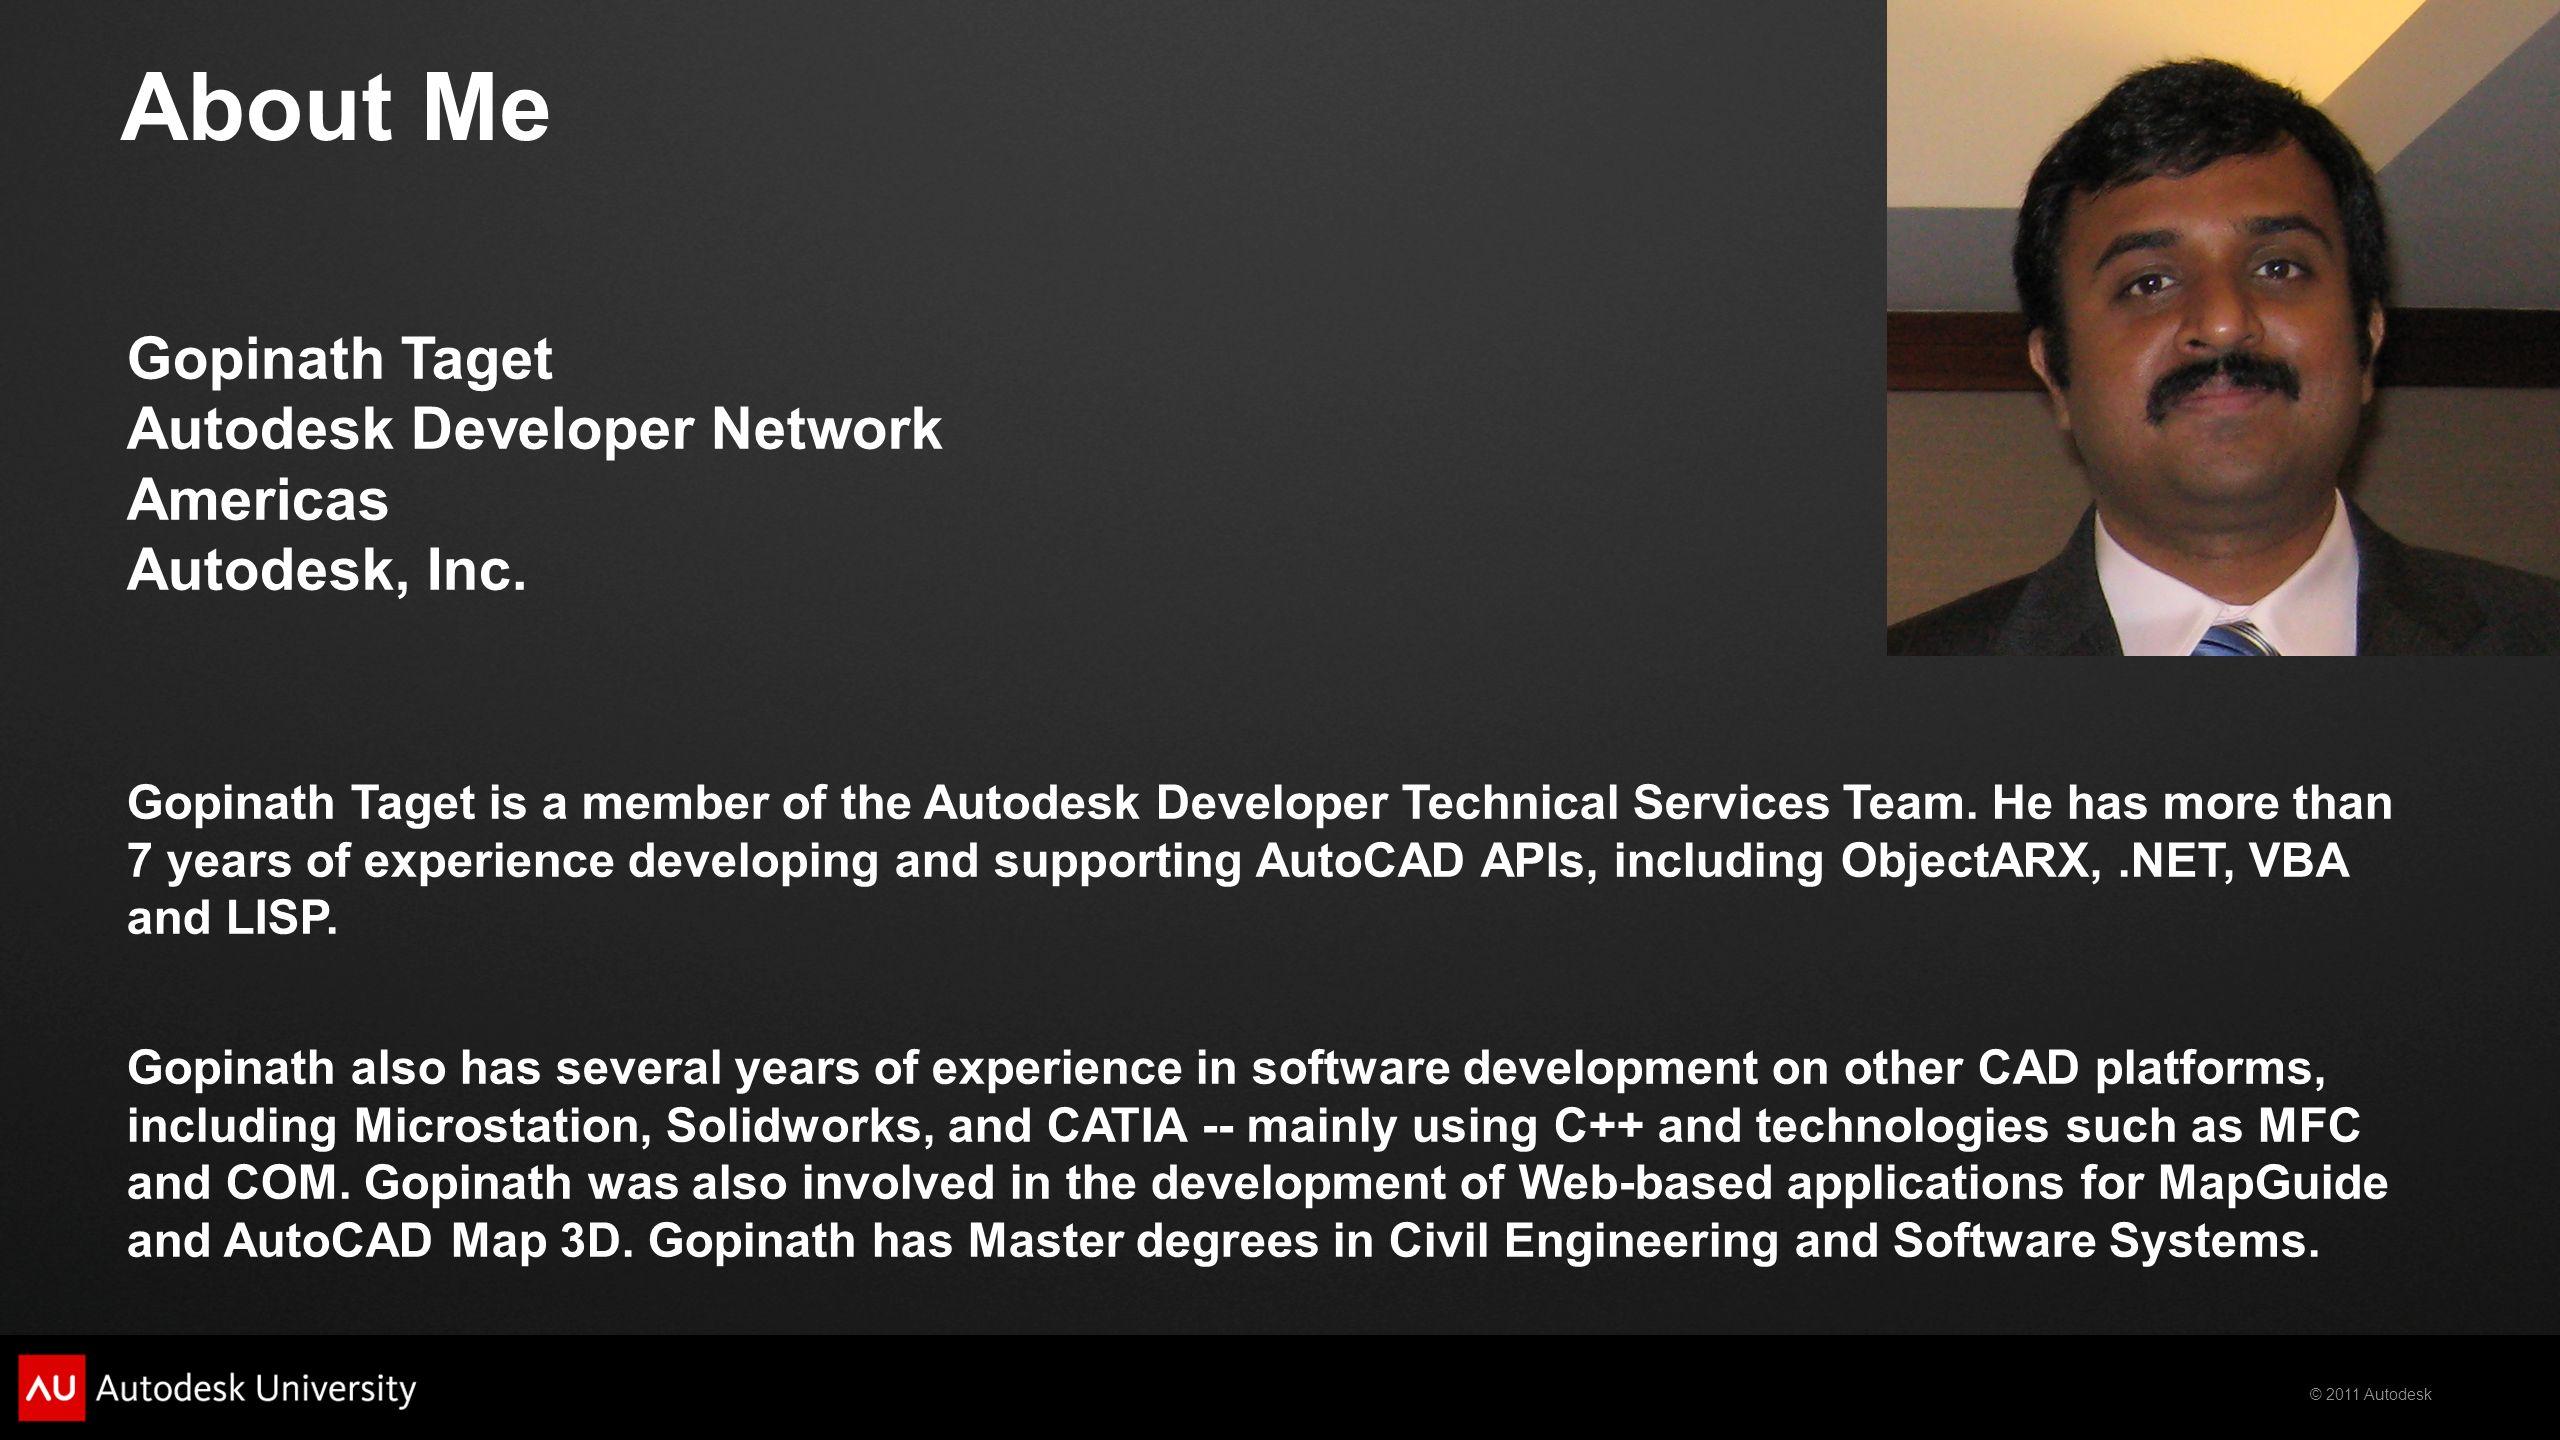 2011 Autodesk Single Job 1 Processor 1 Single Job 2 Single Job 3